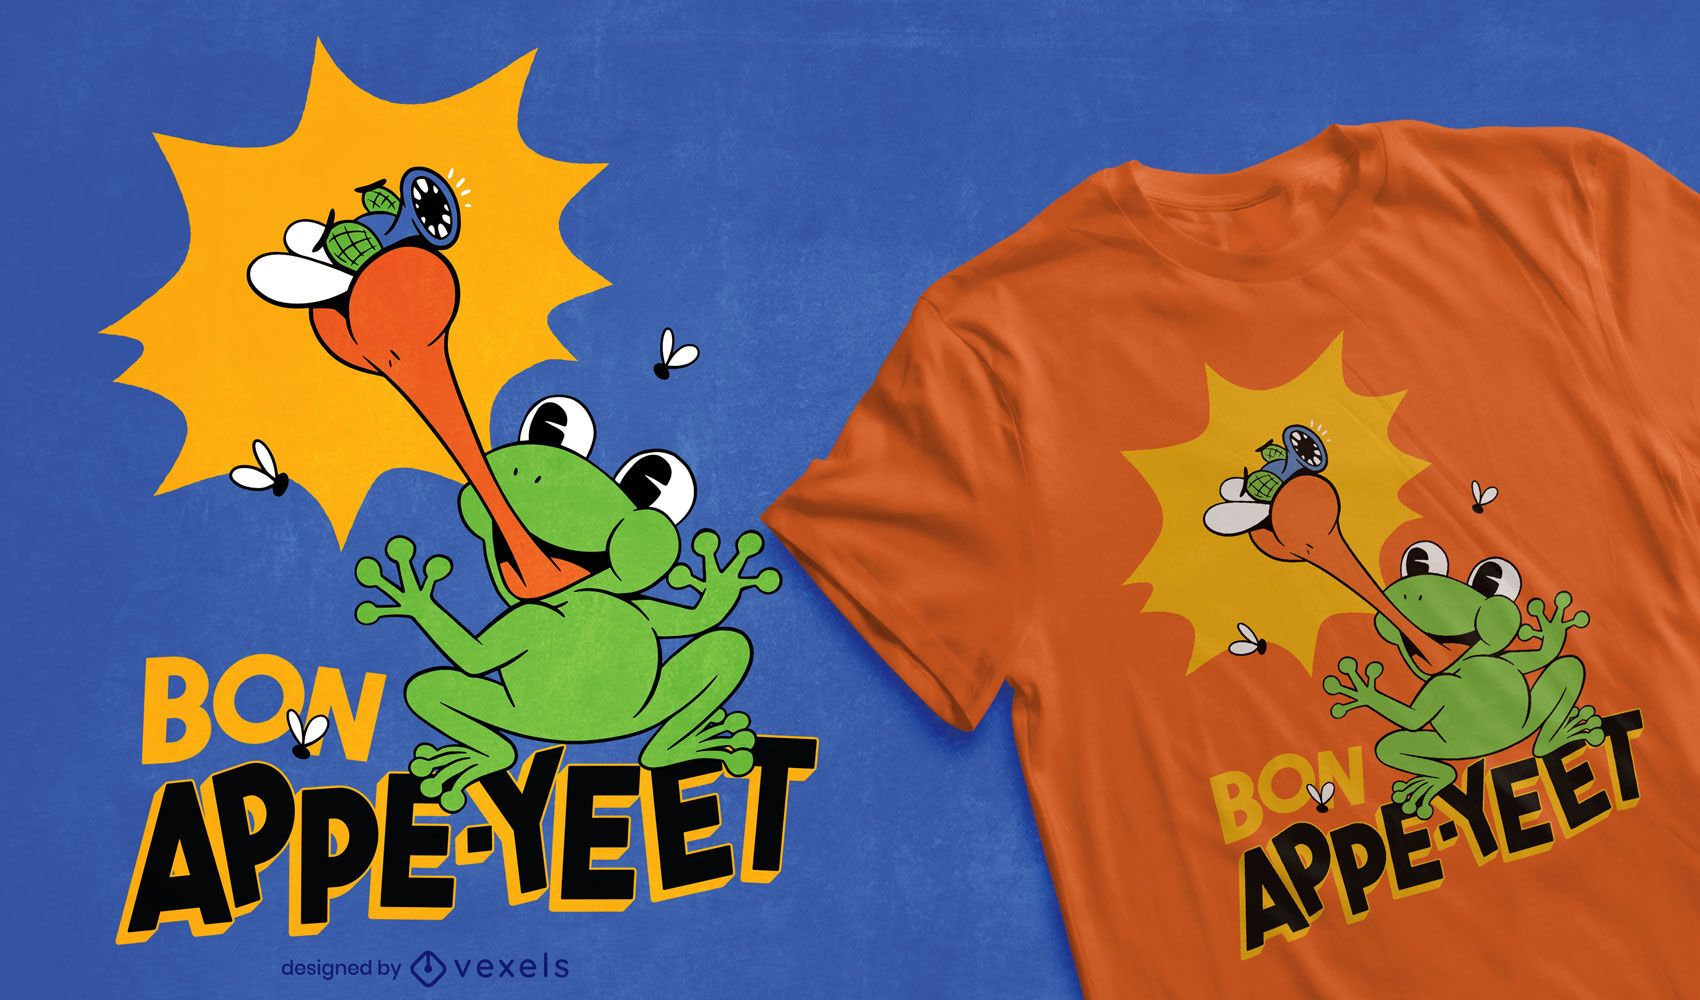 Frog catching fly cartoon t-shirt design